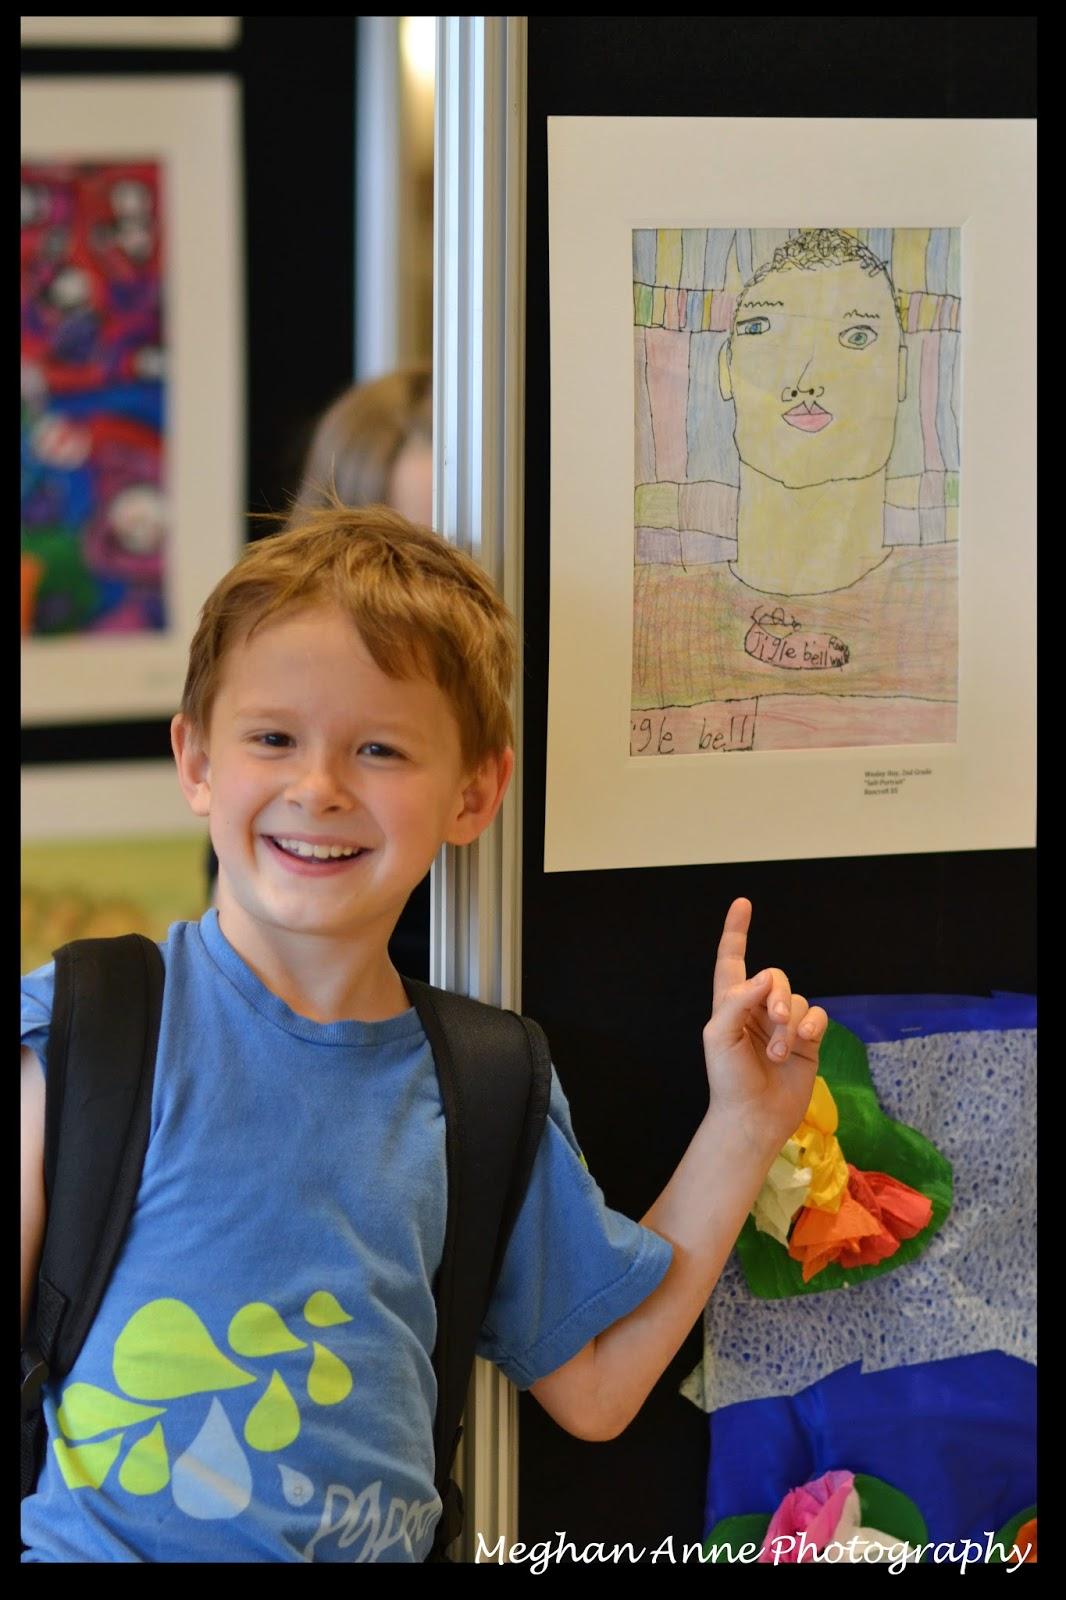 Organized Chaos: An Elementary School Art Room: May 2014